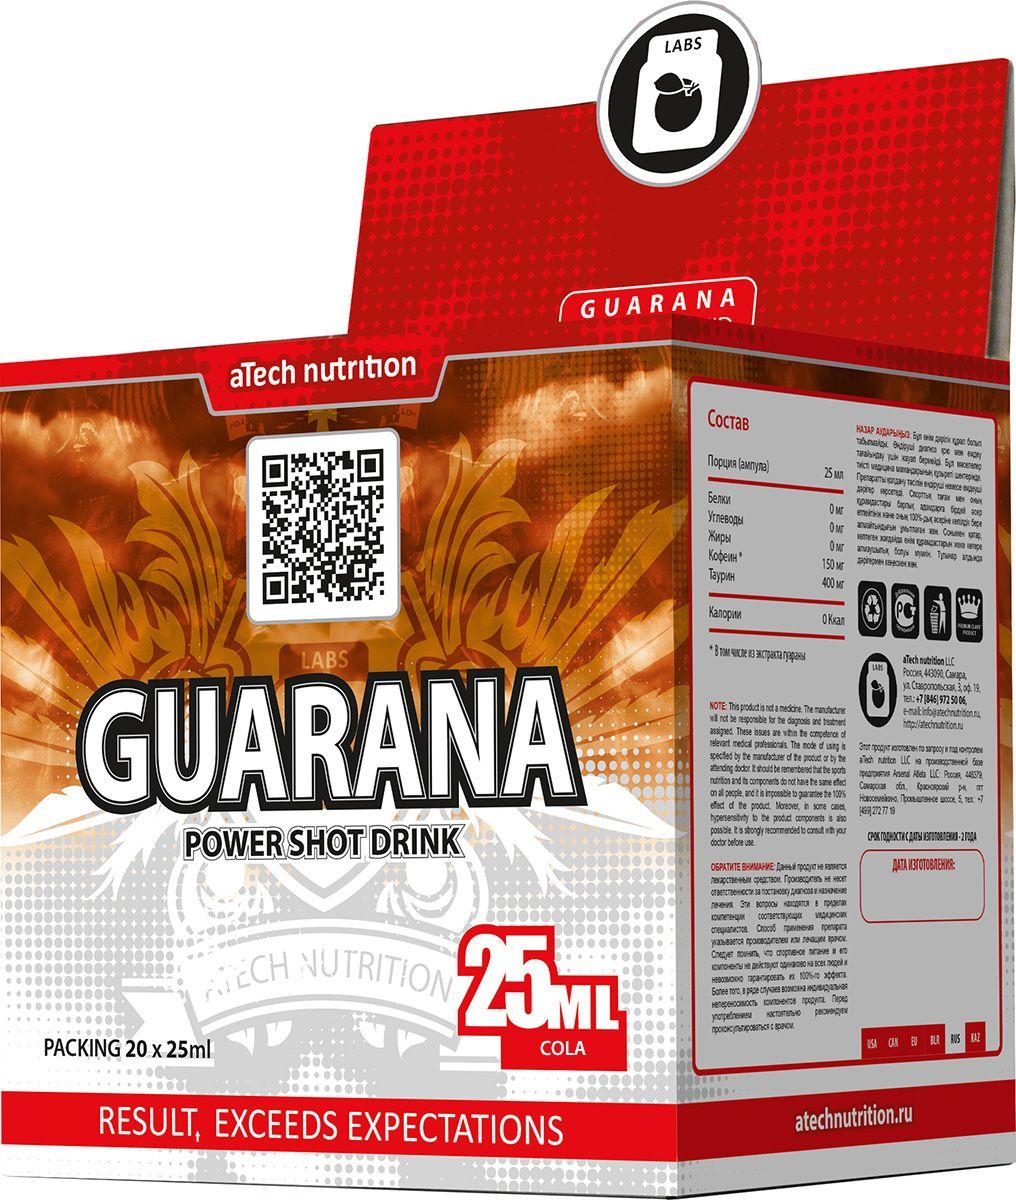 Энергетический напиток aTech Nutrition  Guarana Power Shot Drink , кола, 25 мл, 20 шт - Энергетики